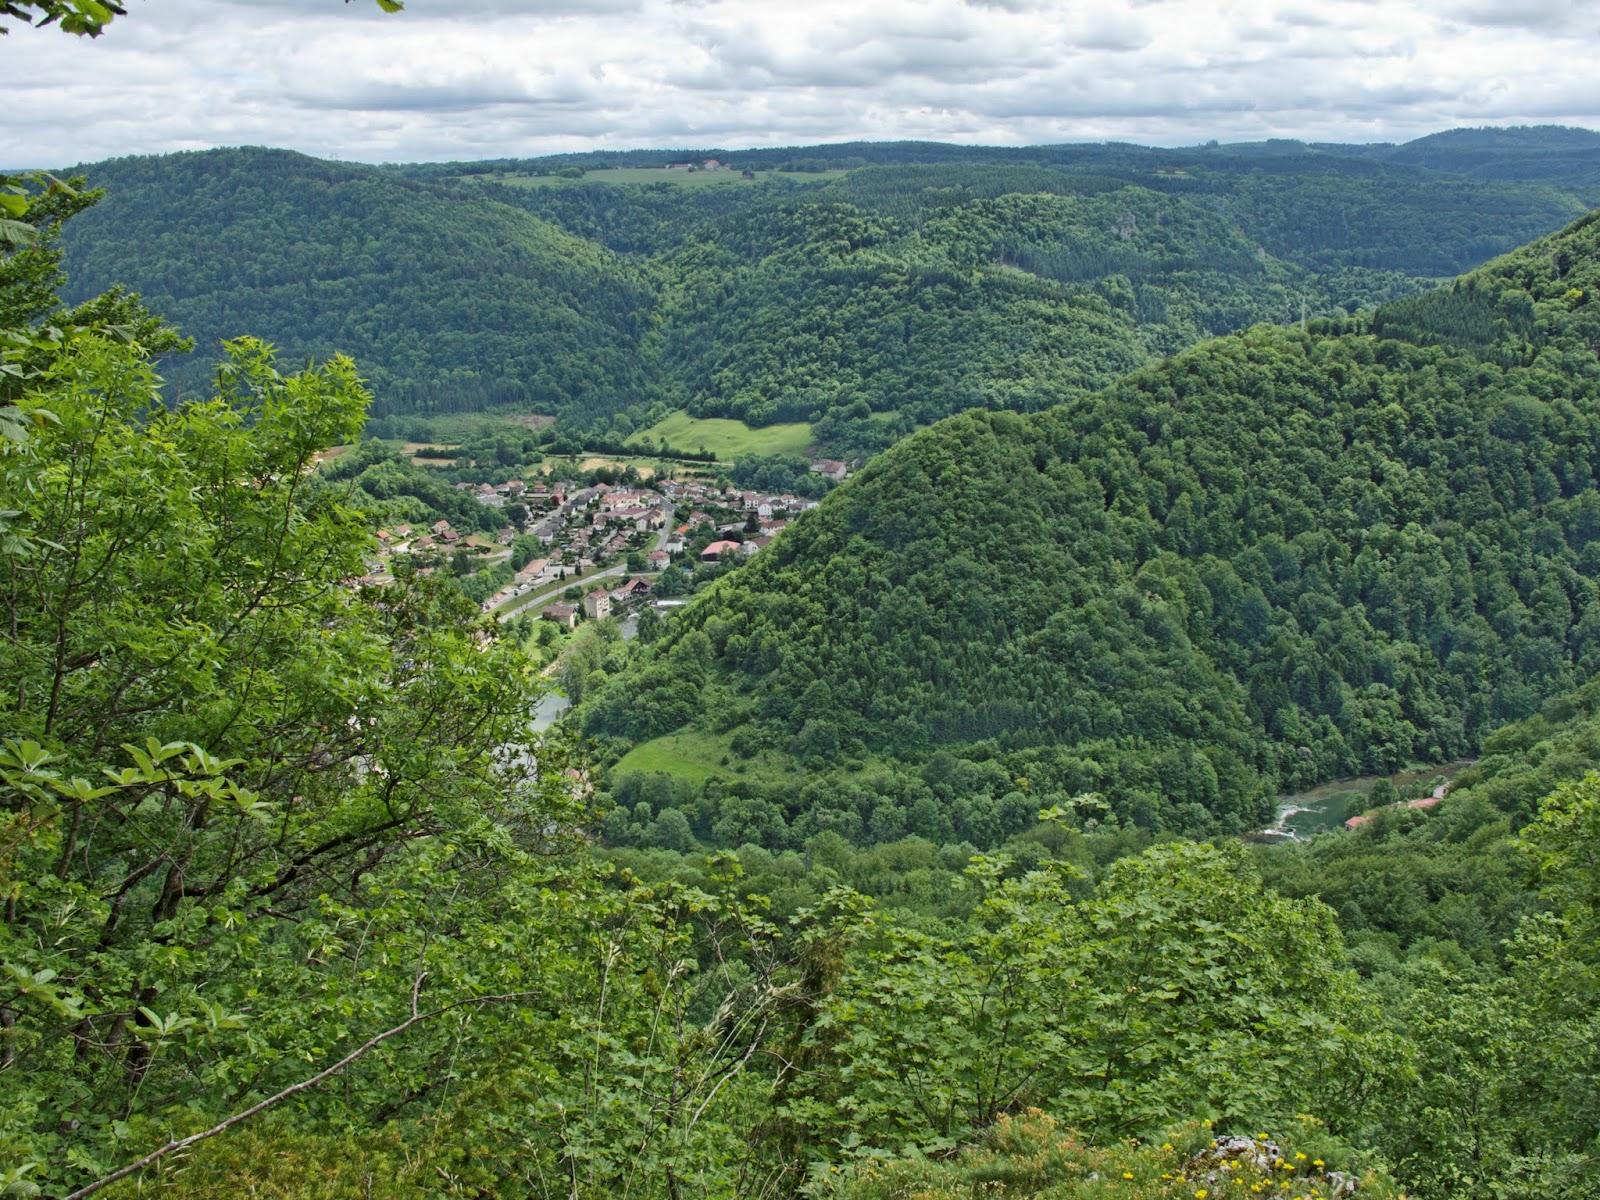 Vallée du Doubs - St Hippolyte